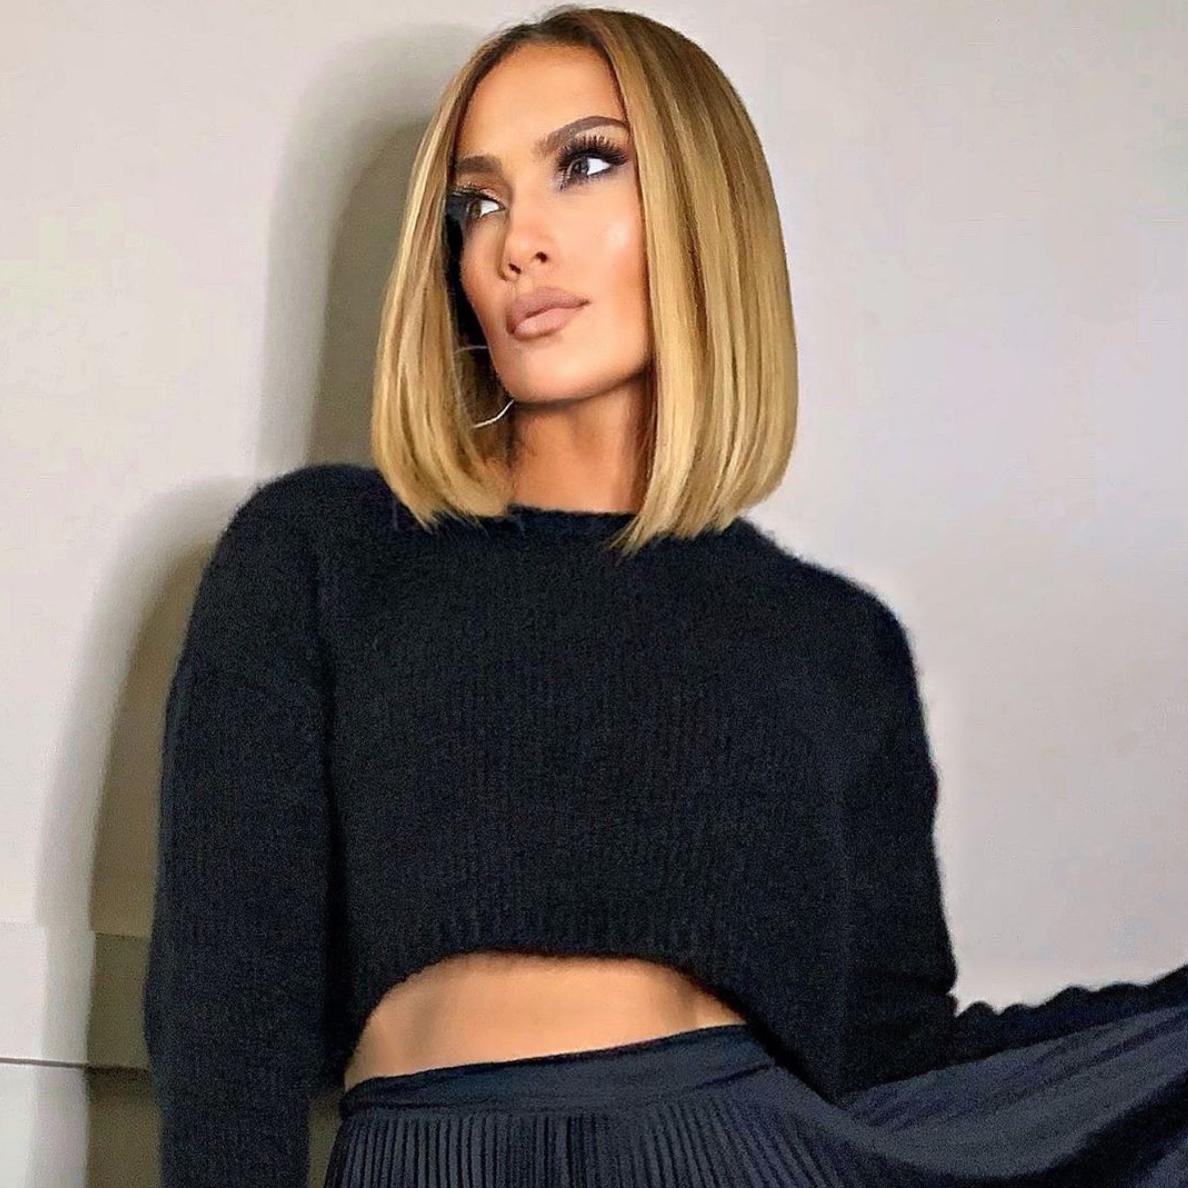 Jennifer Lopez Abgerundeter Lob-Haarschnitt